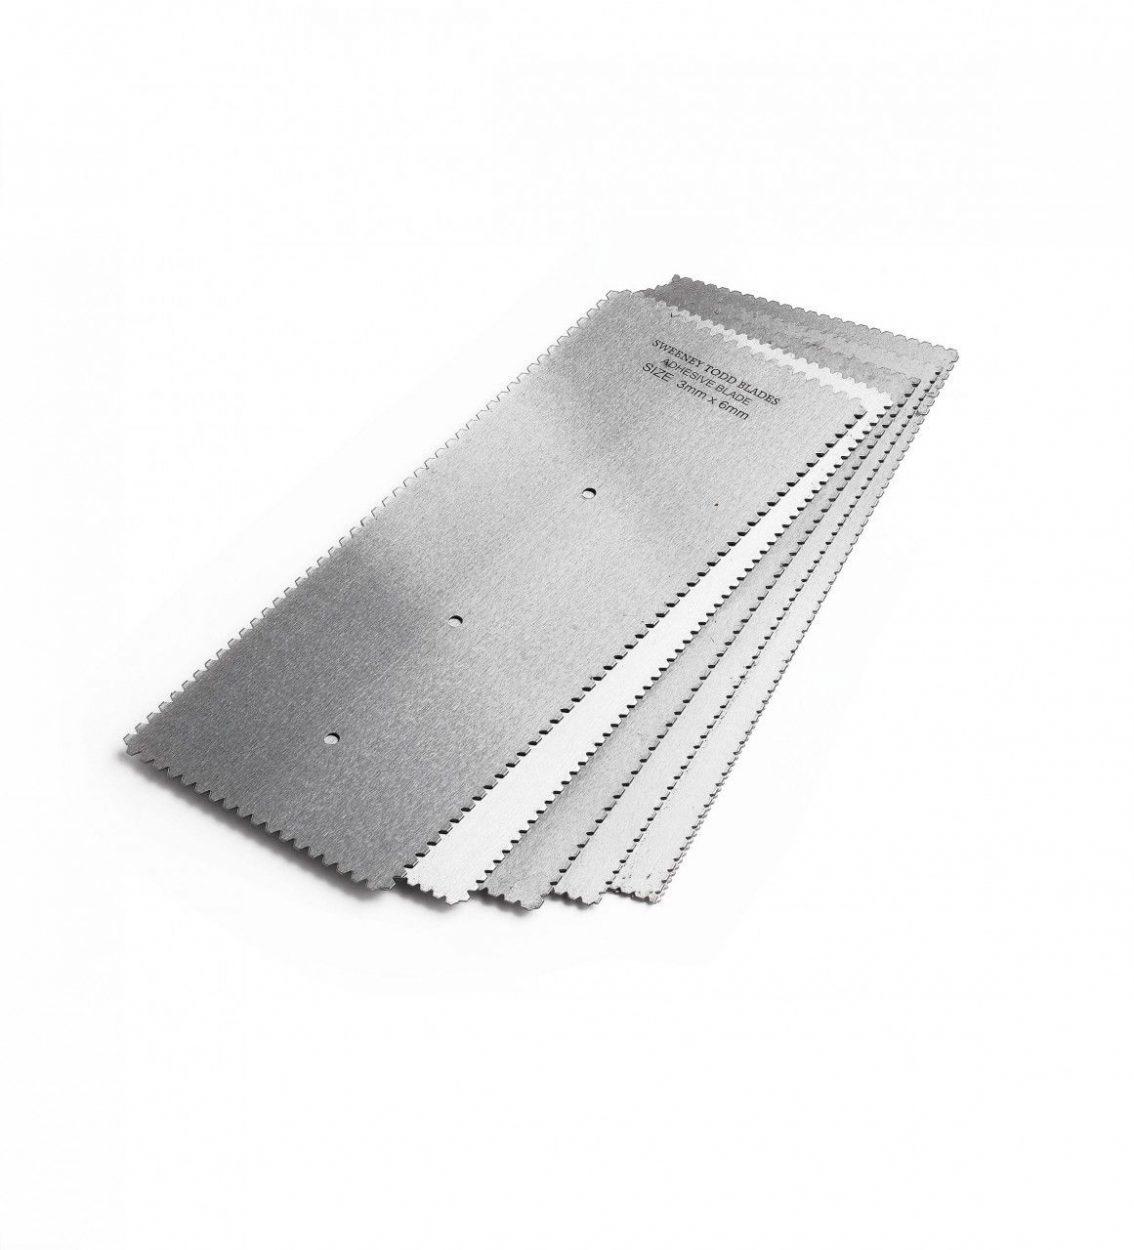 A2 Adhesive Trowel Flooring Tools Online Quality Tools